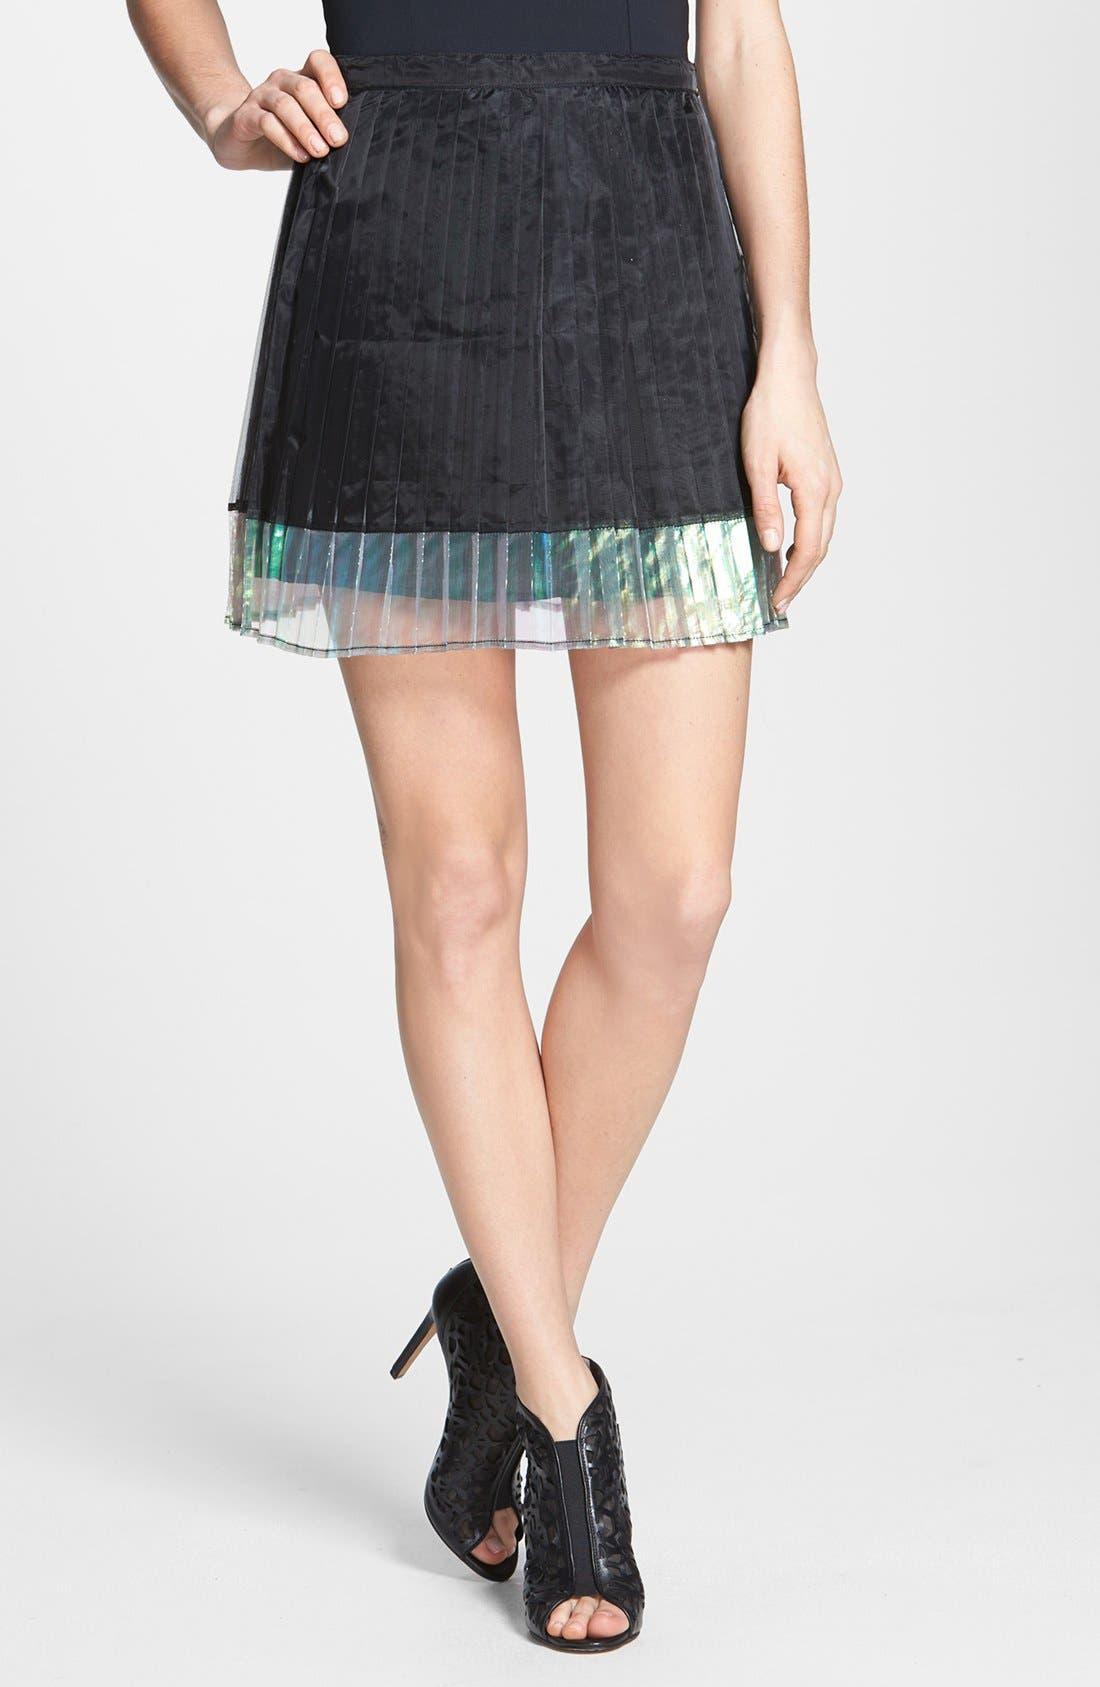 Alternate Image 1 Selected - MINKPINK 'Mother of Pearl' Knife Pleat Skirt